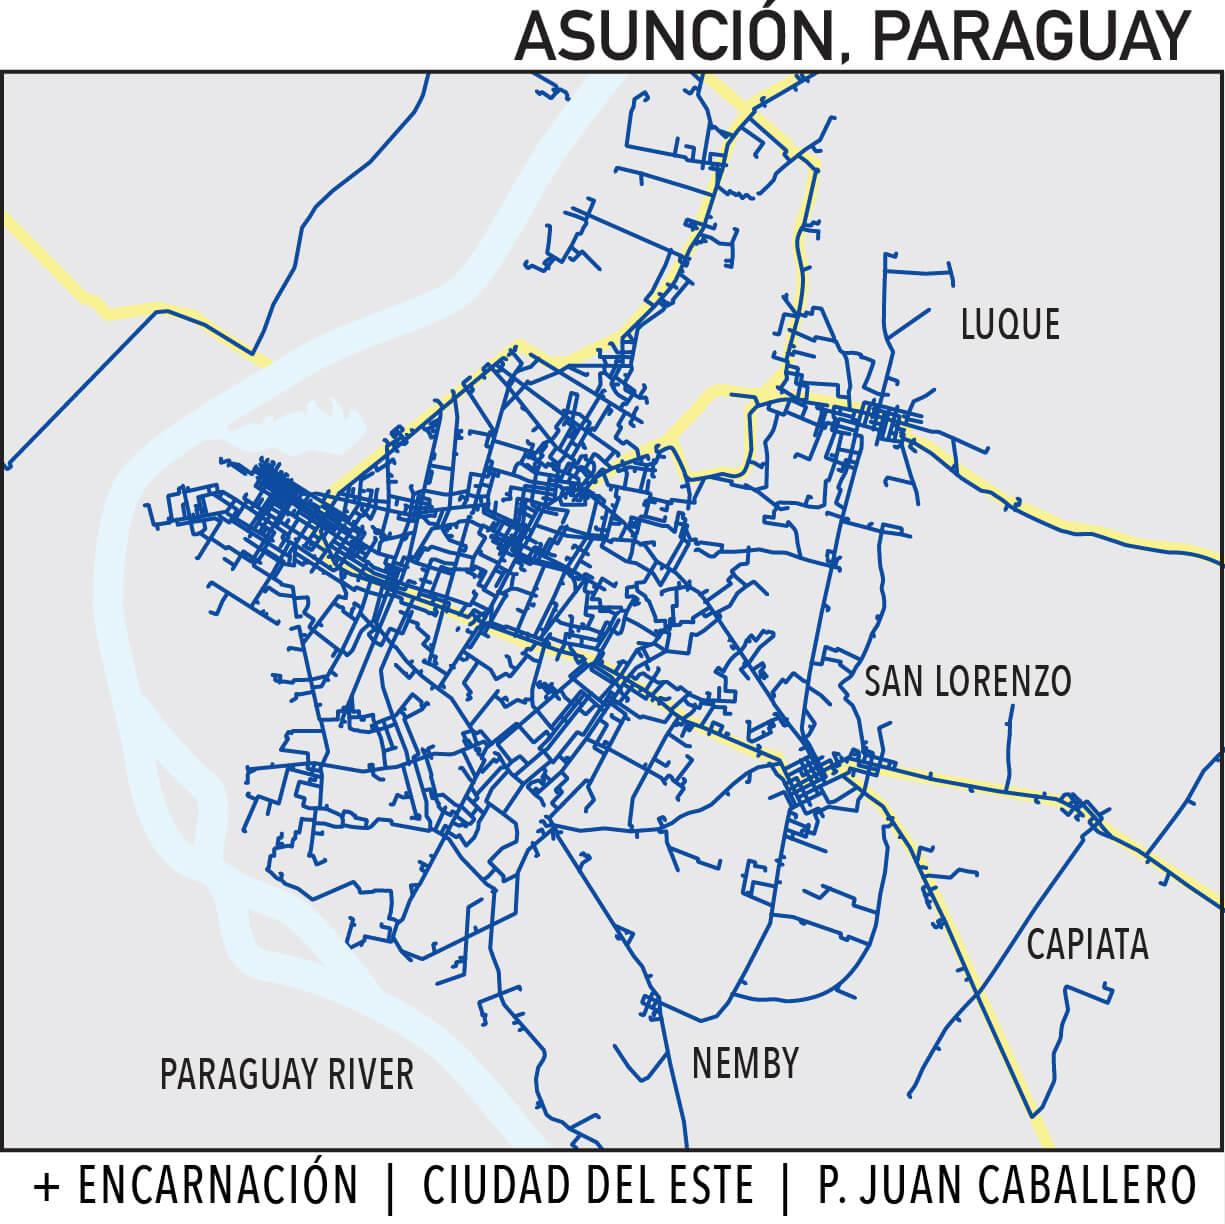 Capillarity Paraguay map Ufinet